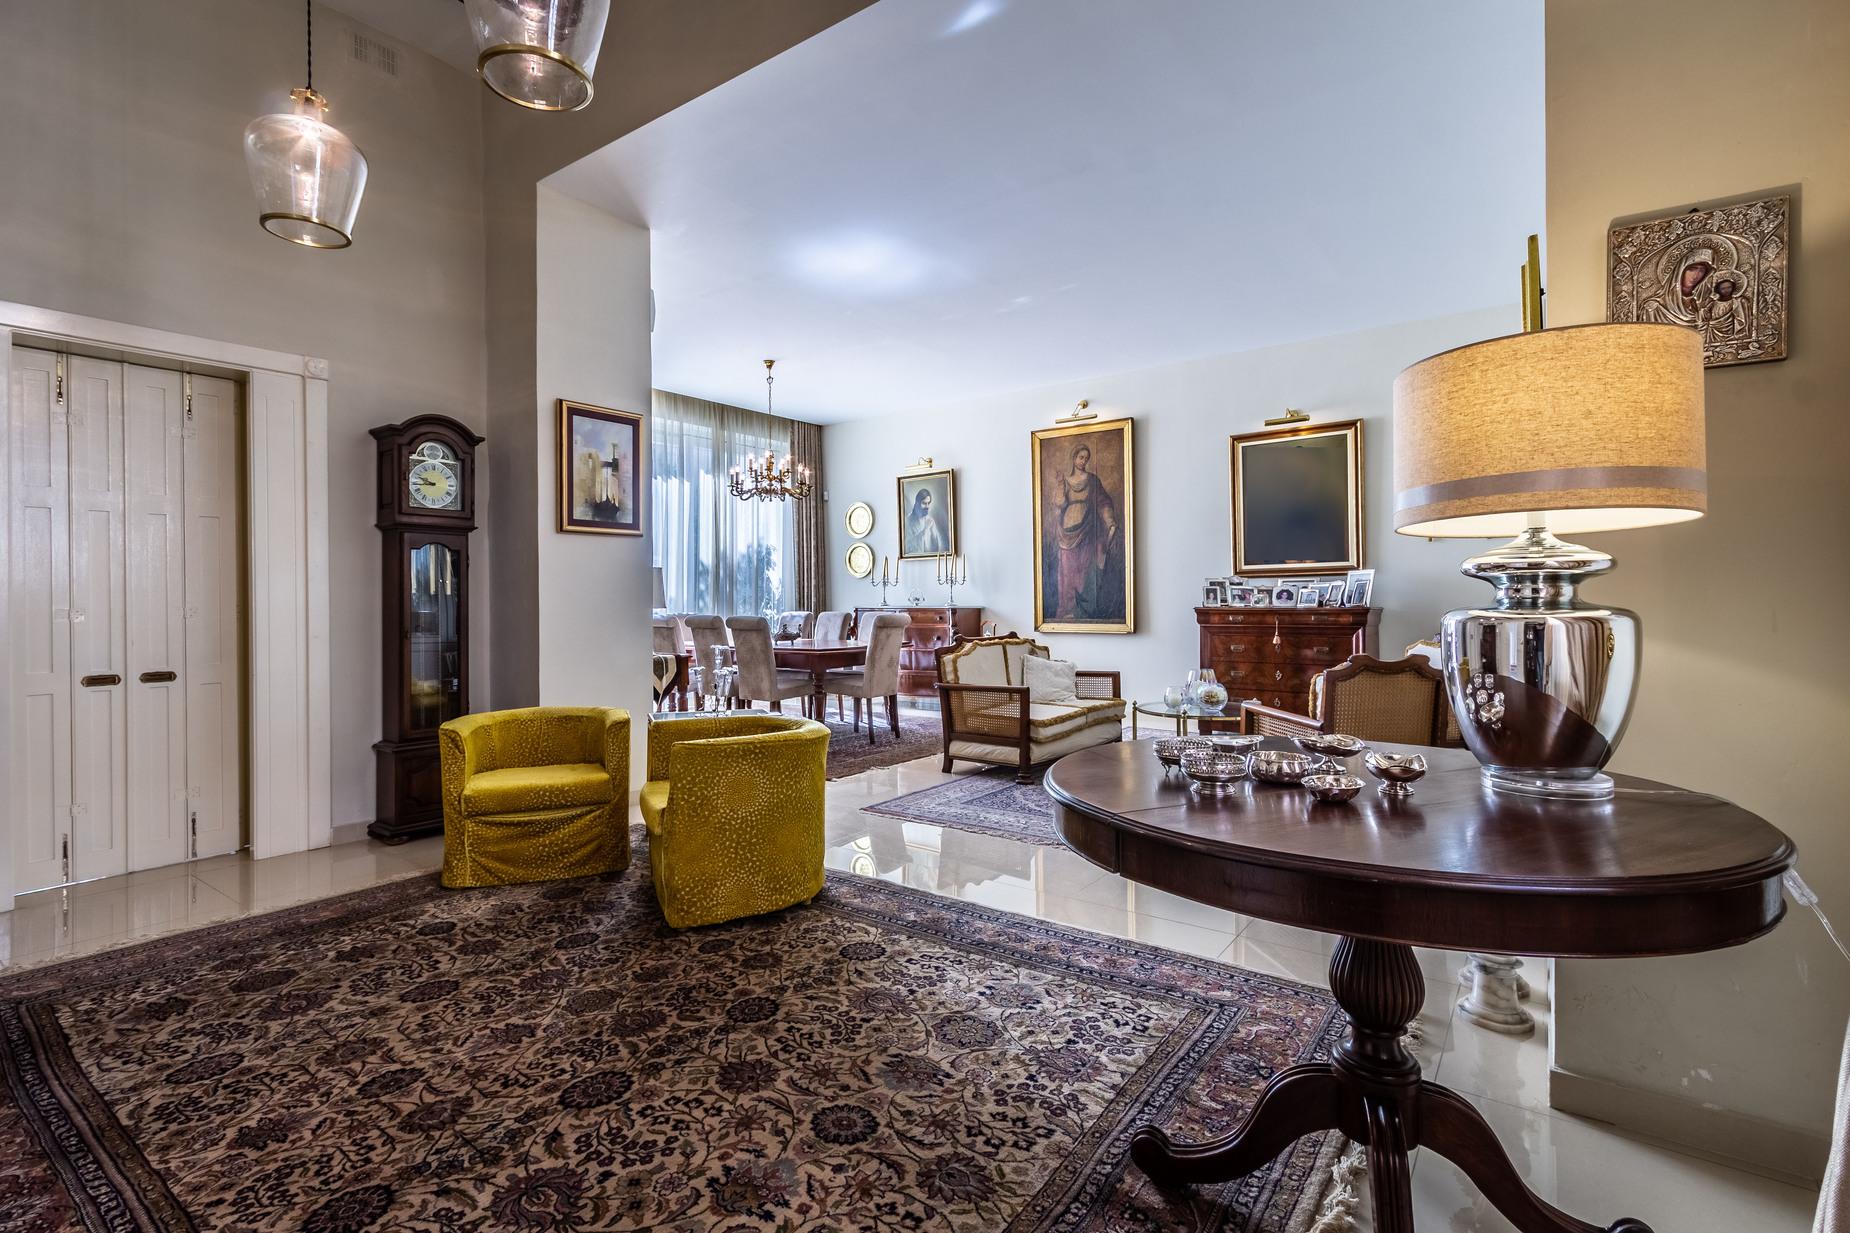 3 bed Town House For Sale in Balzan, Balzan - thumb 3